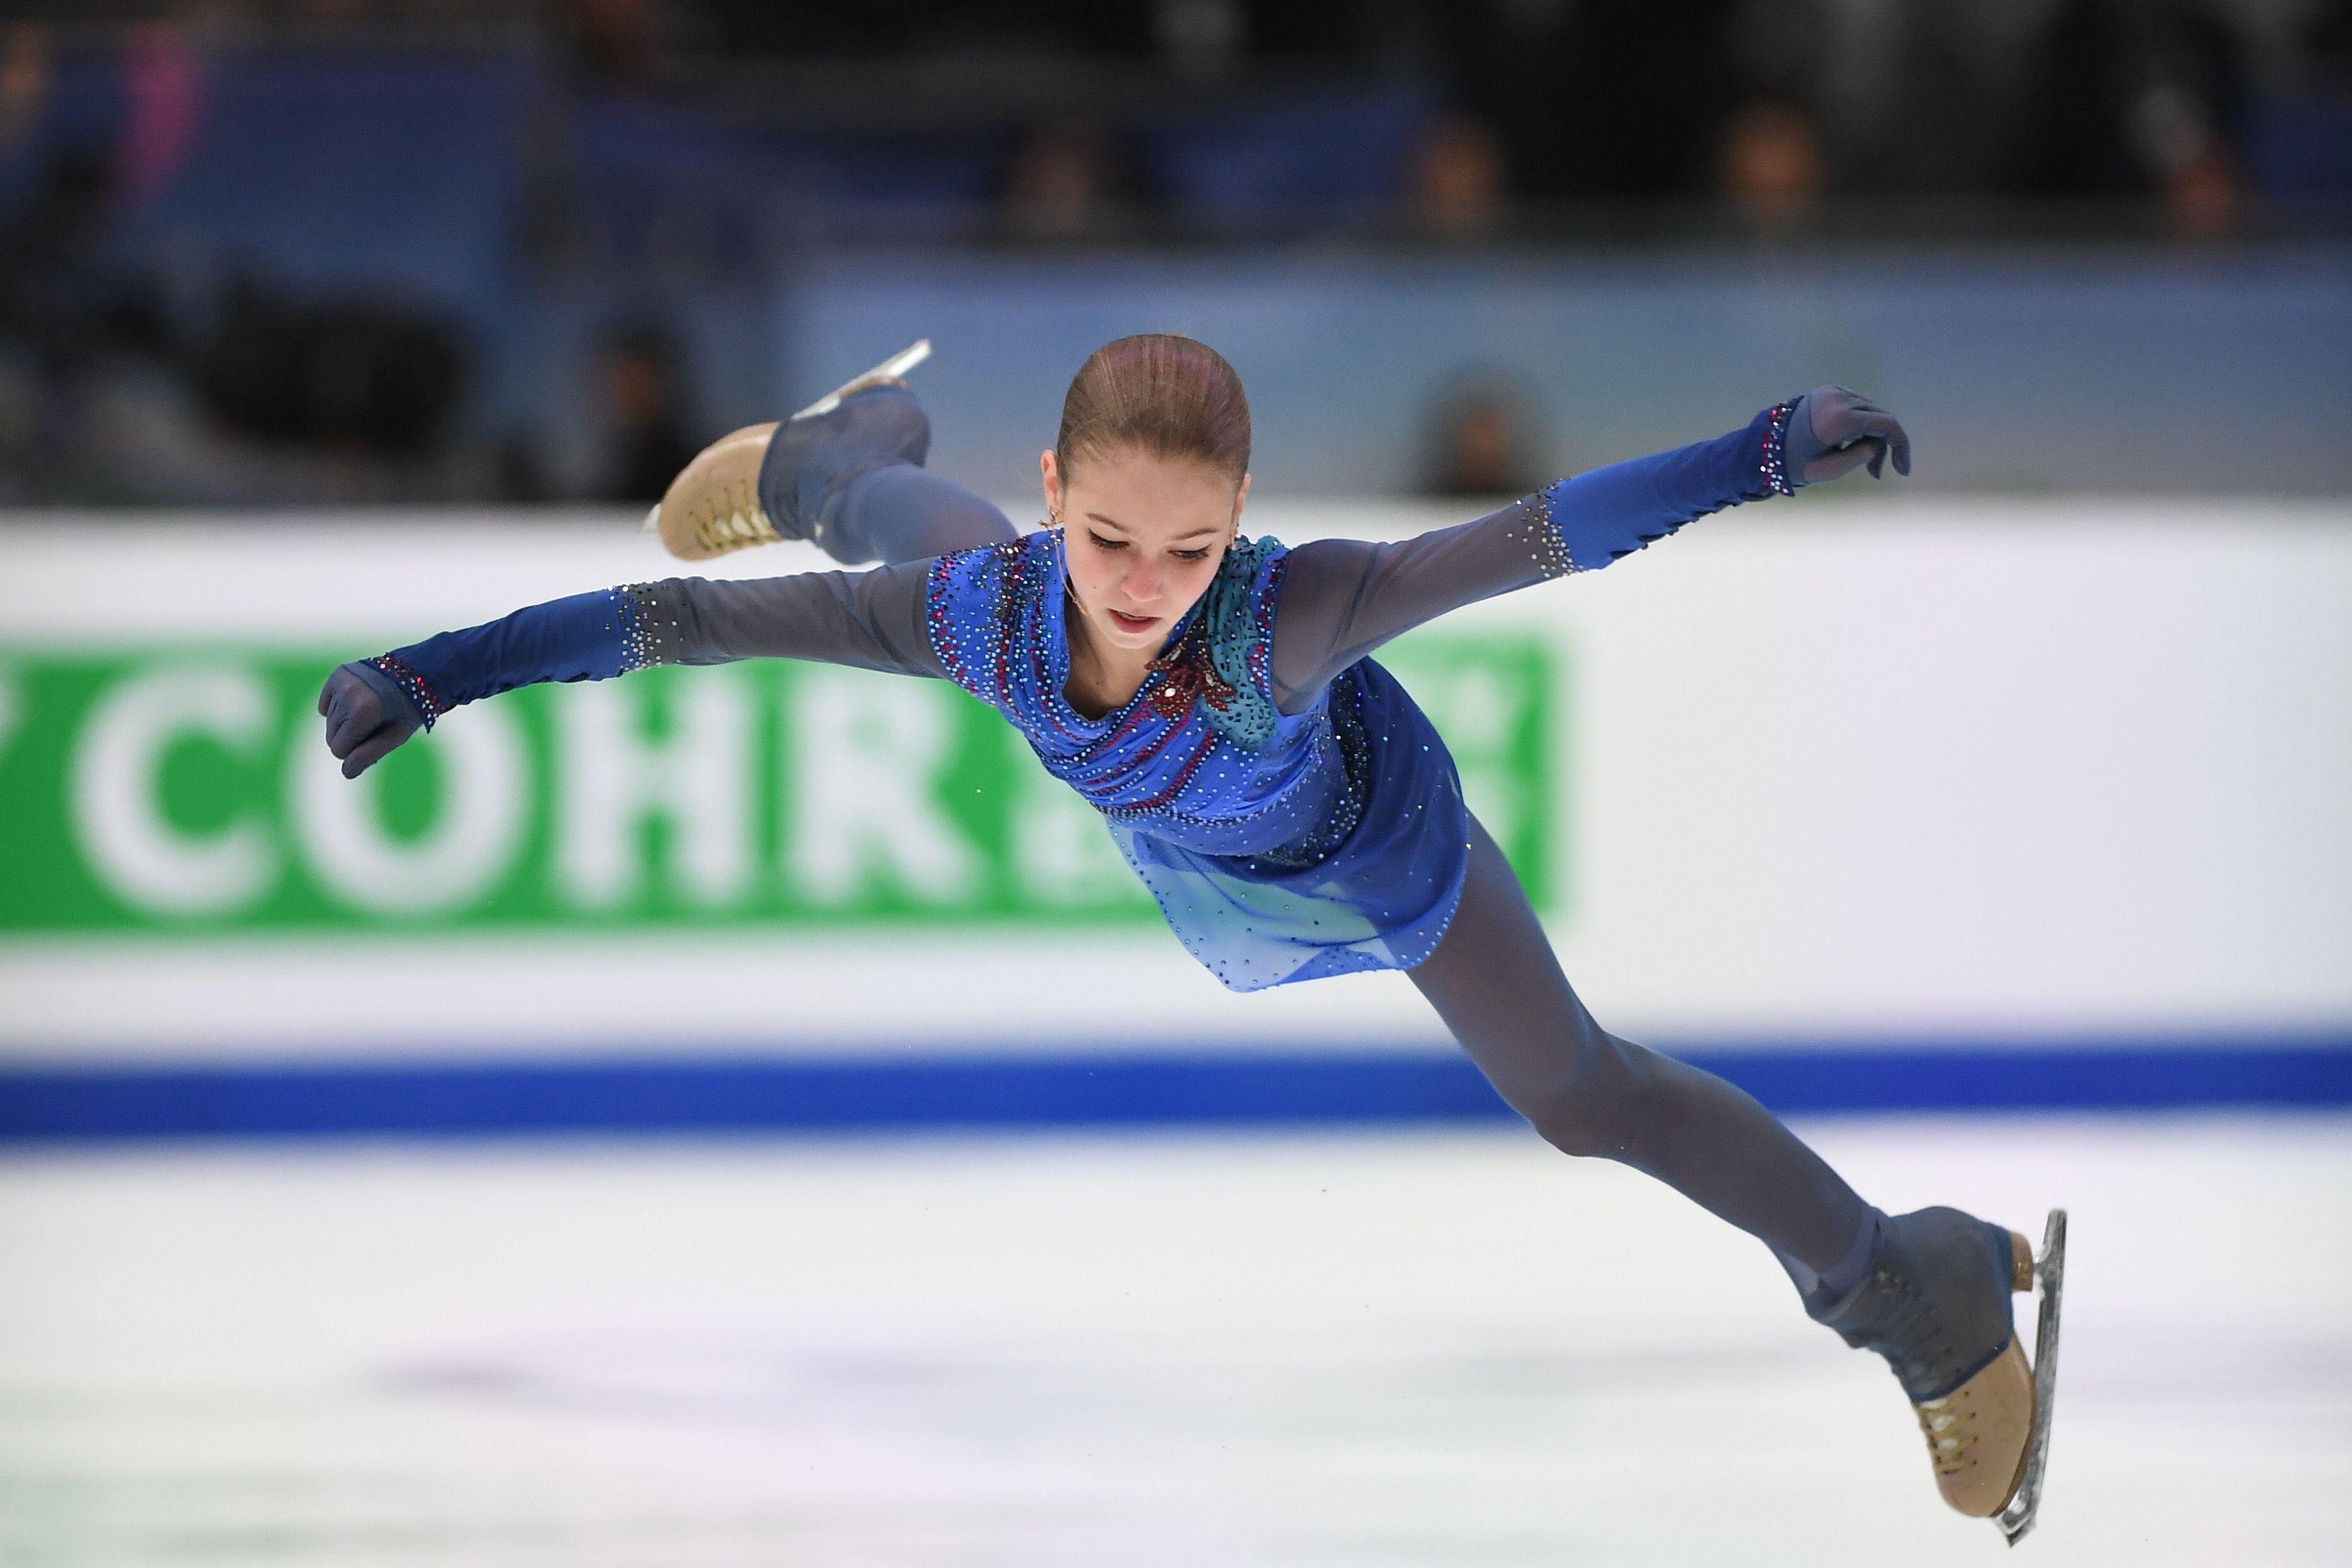 Трусова в роскошном вечернем костюме сходила на балет вместе с Плющенко. ФОТО